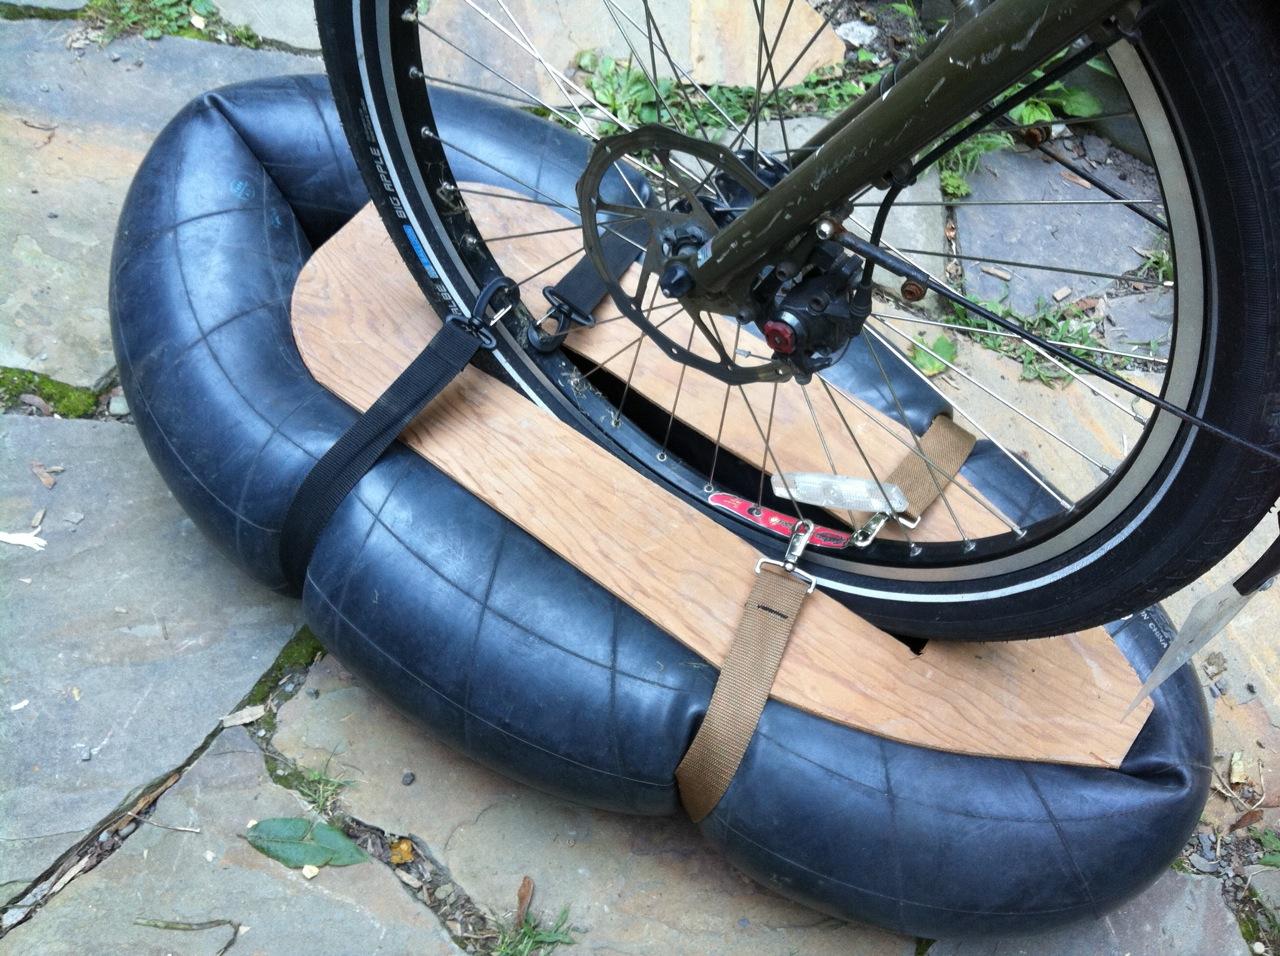 Aqua-Xtracycle, the Amphibious Bicycle - Bikes As ...